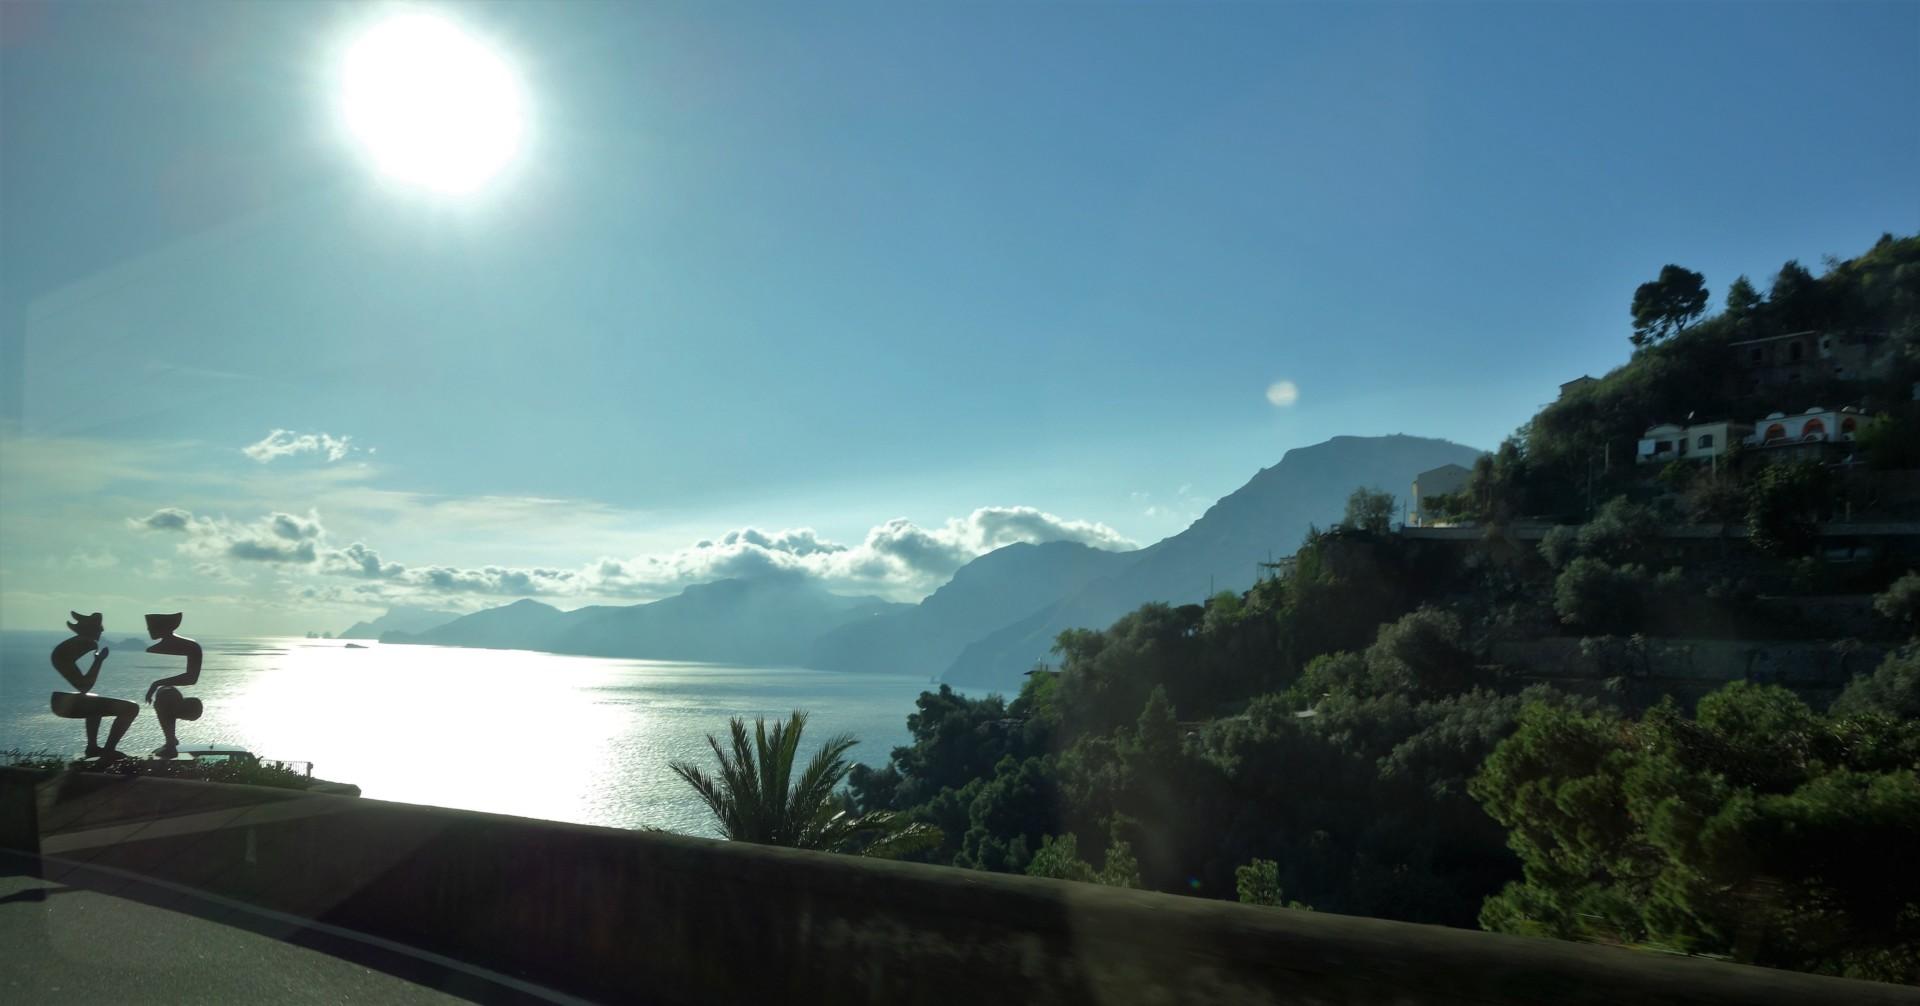 Aamalfitana: Nie endendes Gespräch, Costa Amalfitana